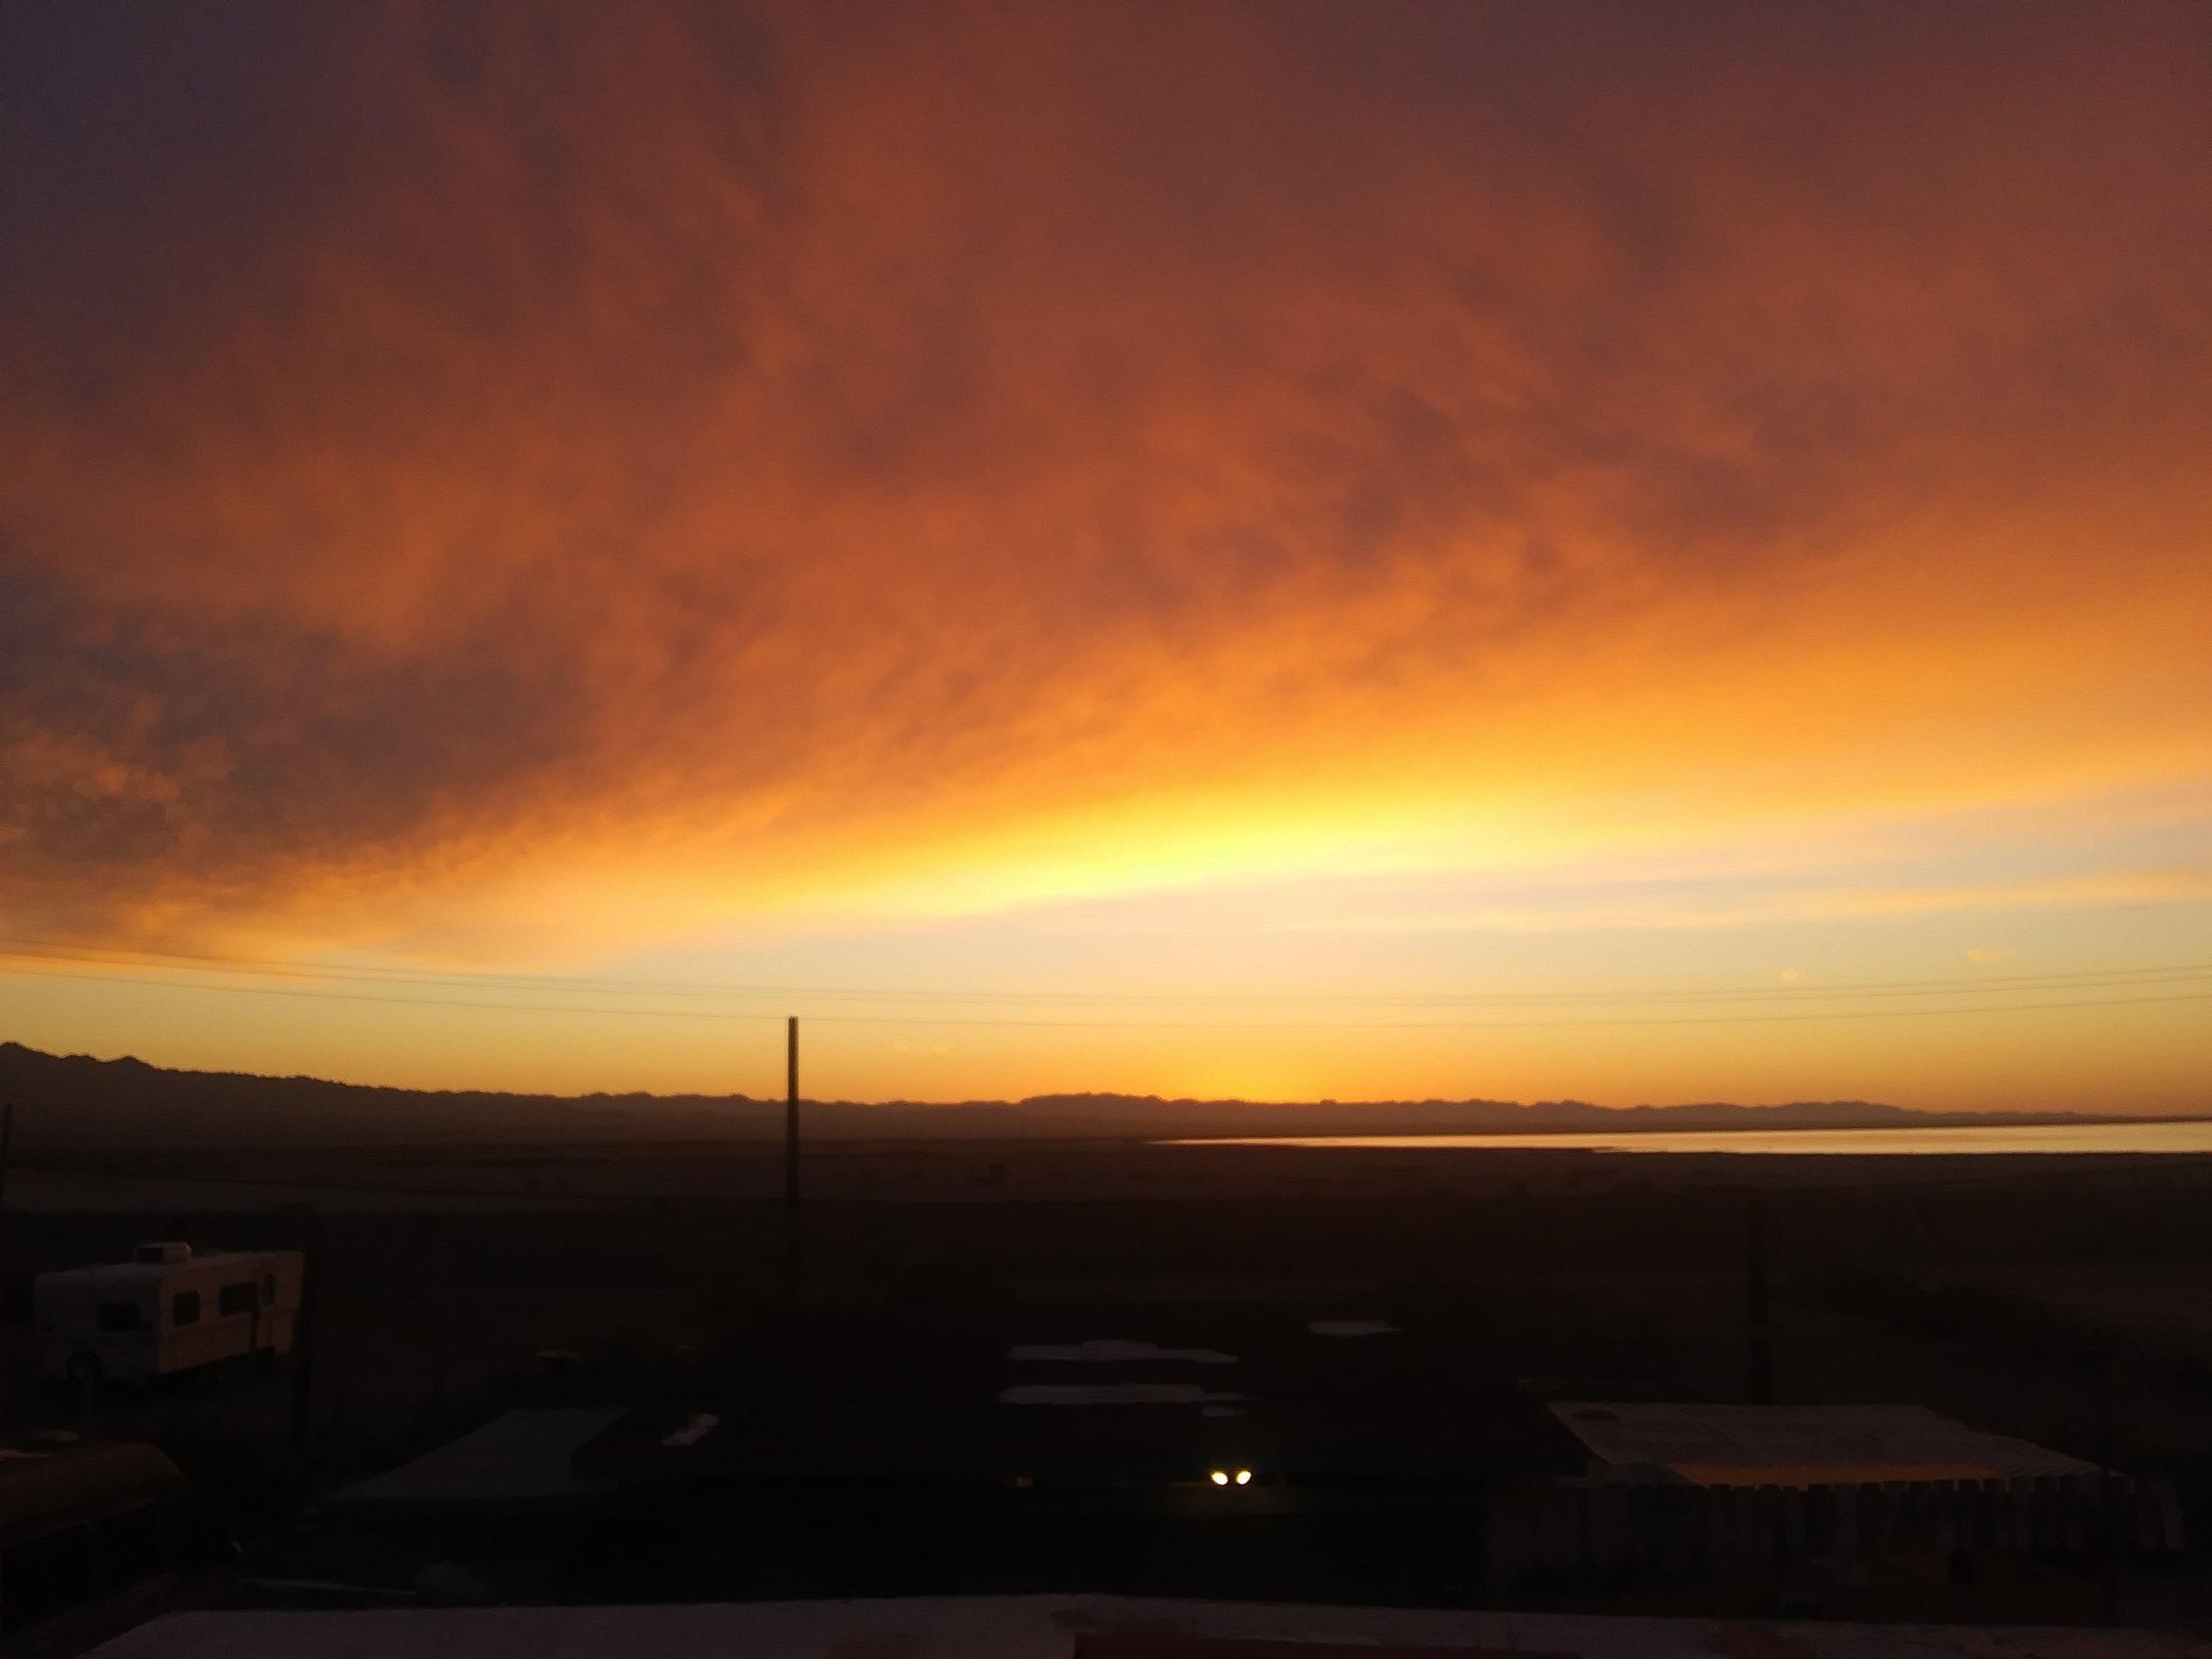 Sunrise on the Salton Sea from Bombay Beach, CA